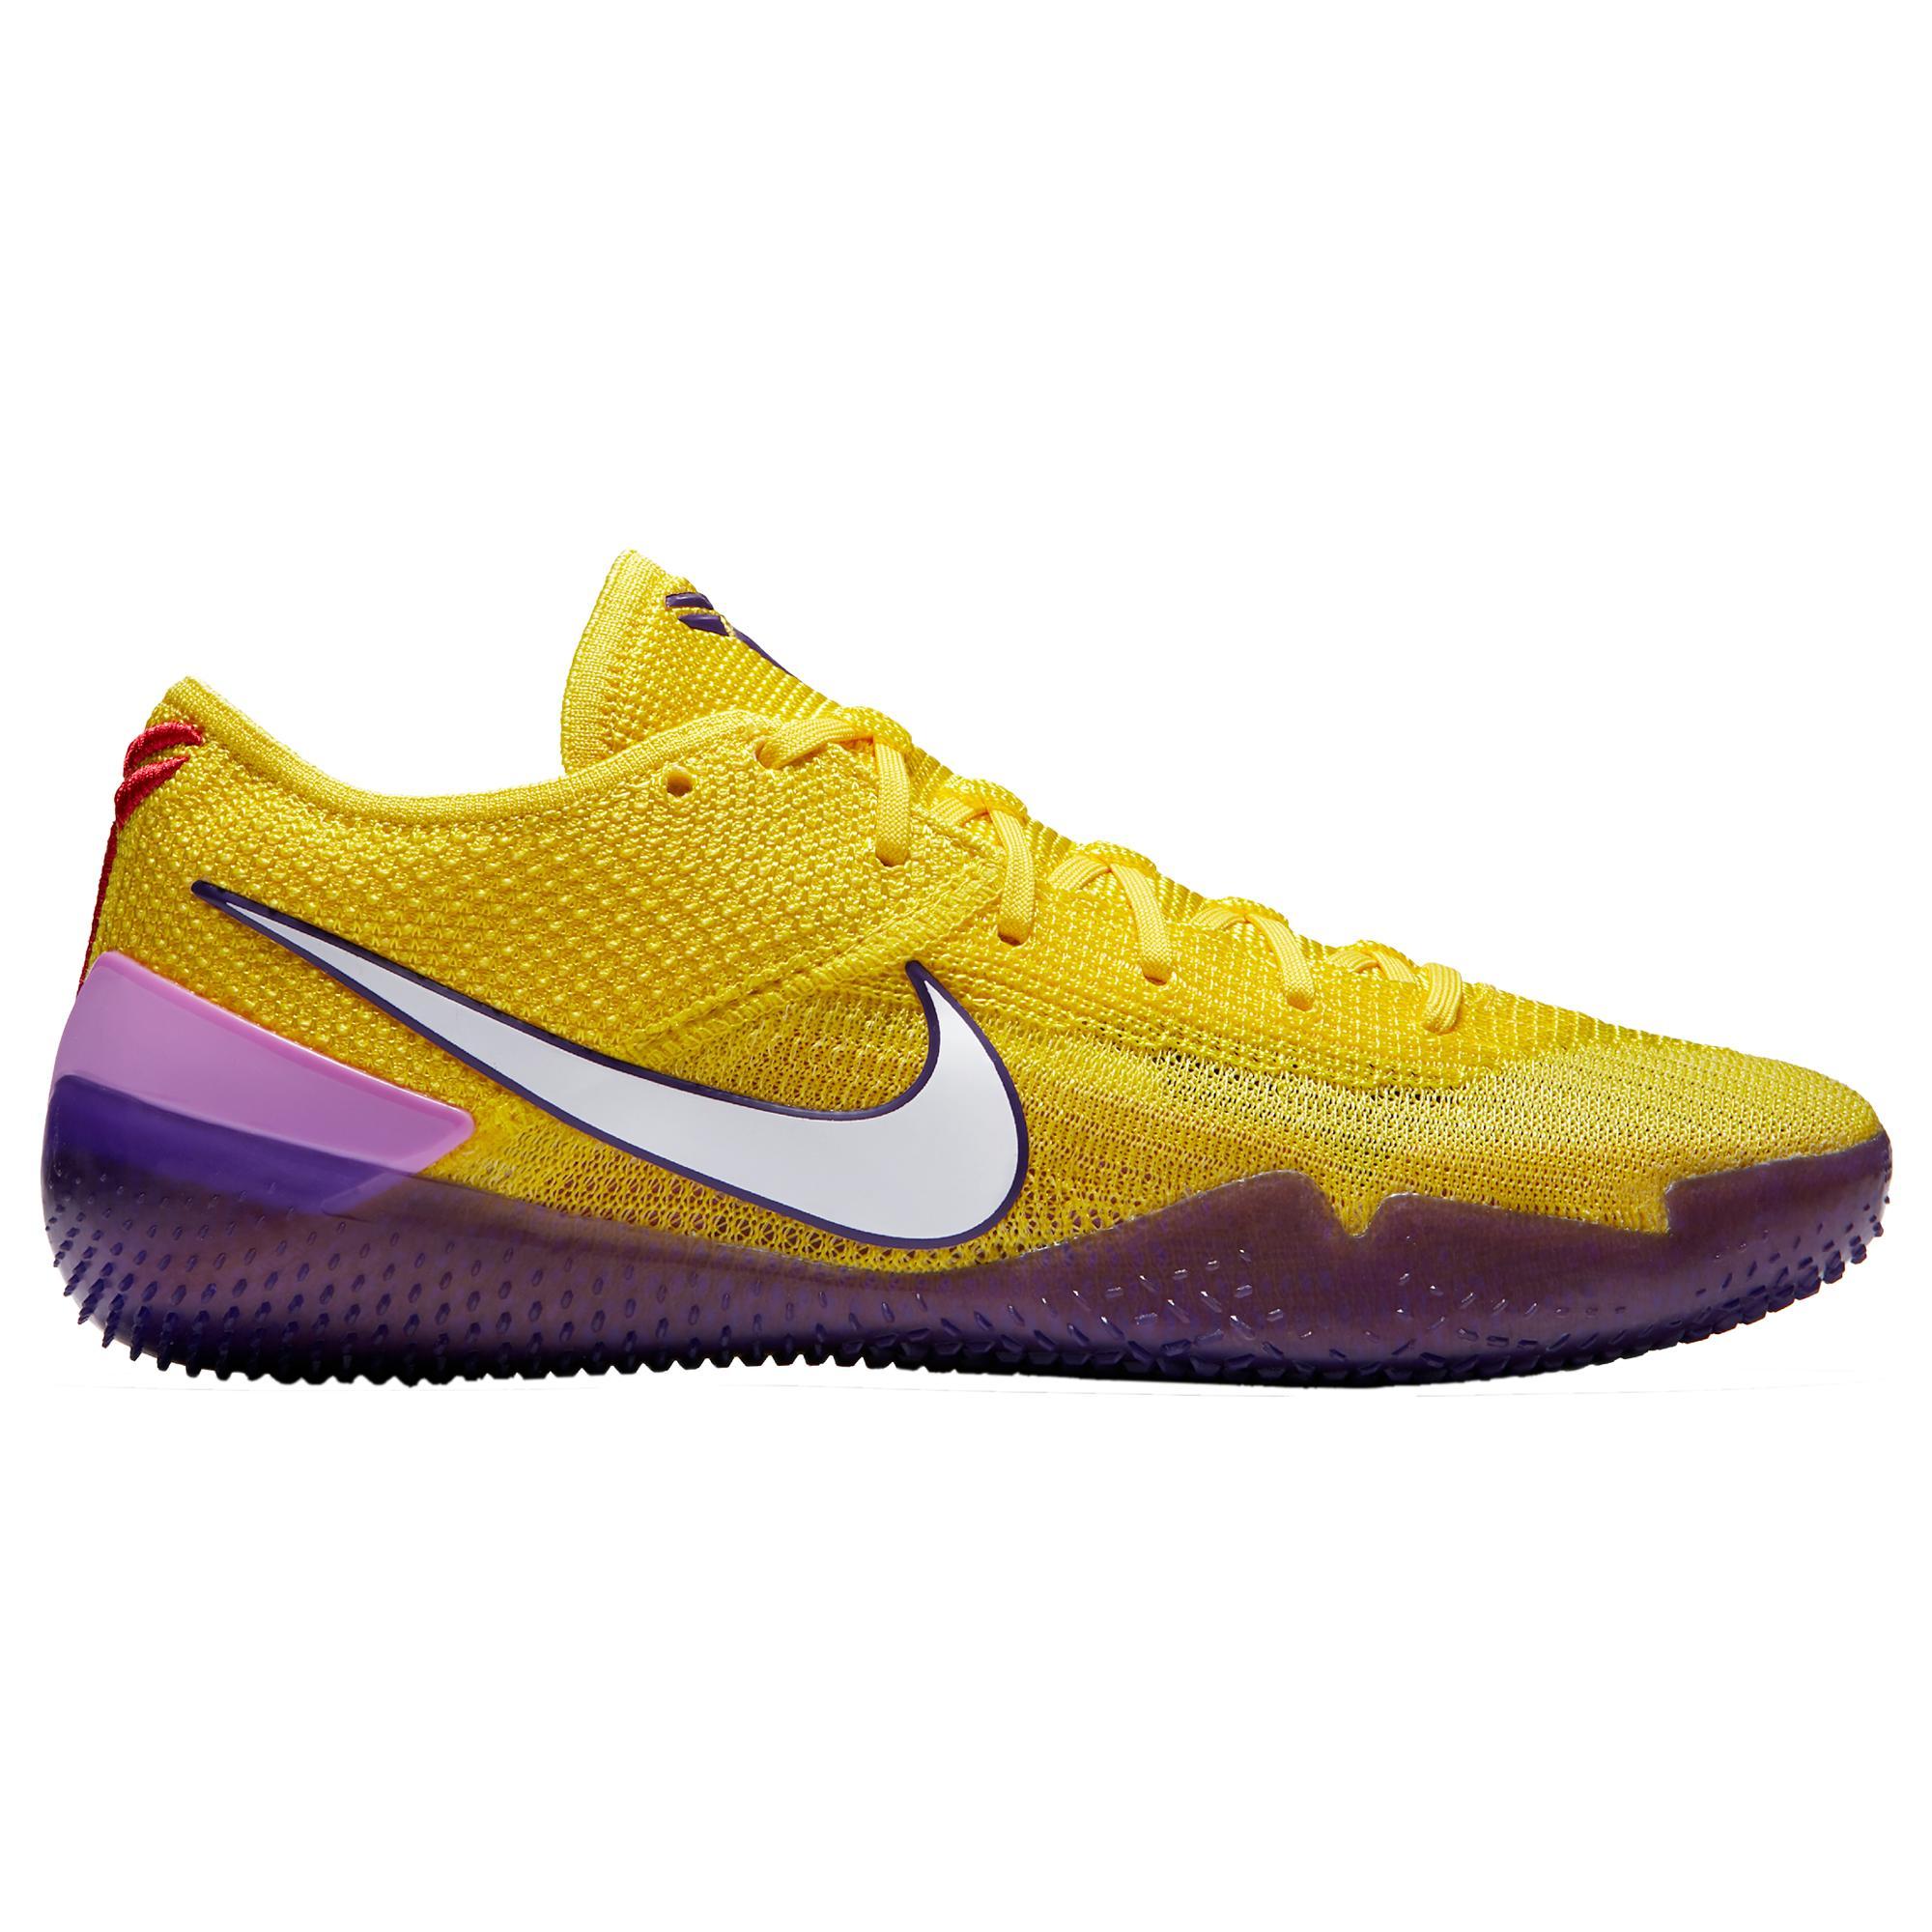 brand new d4852 220c0 Nike Kobe Bryant Kobe Ad Nxt 360 in Yellow for Men - Lyst